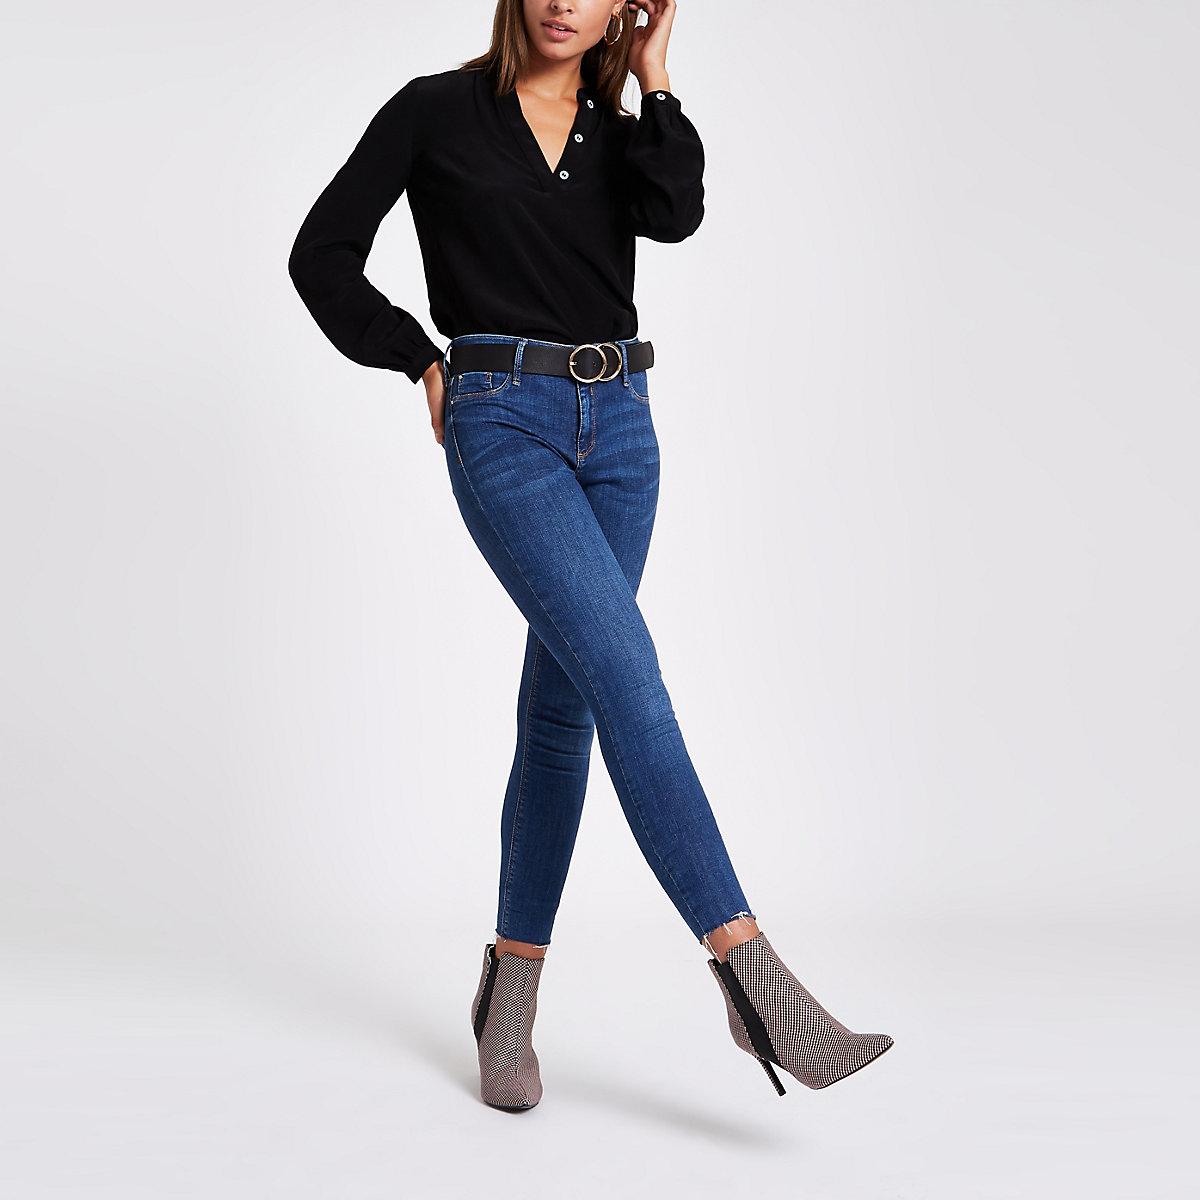 Black button long sleeve split back blouse